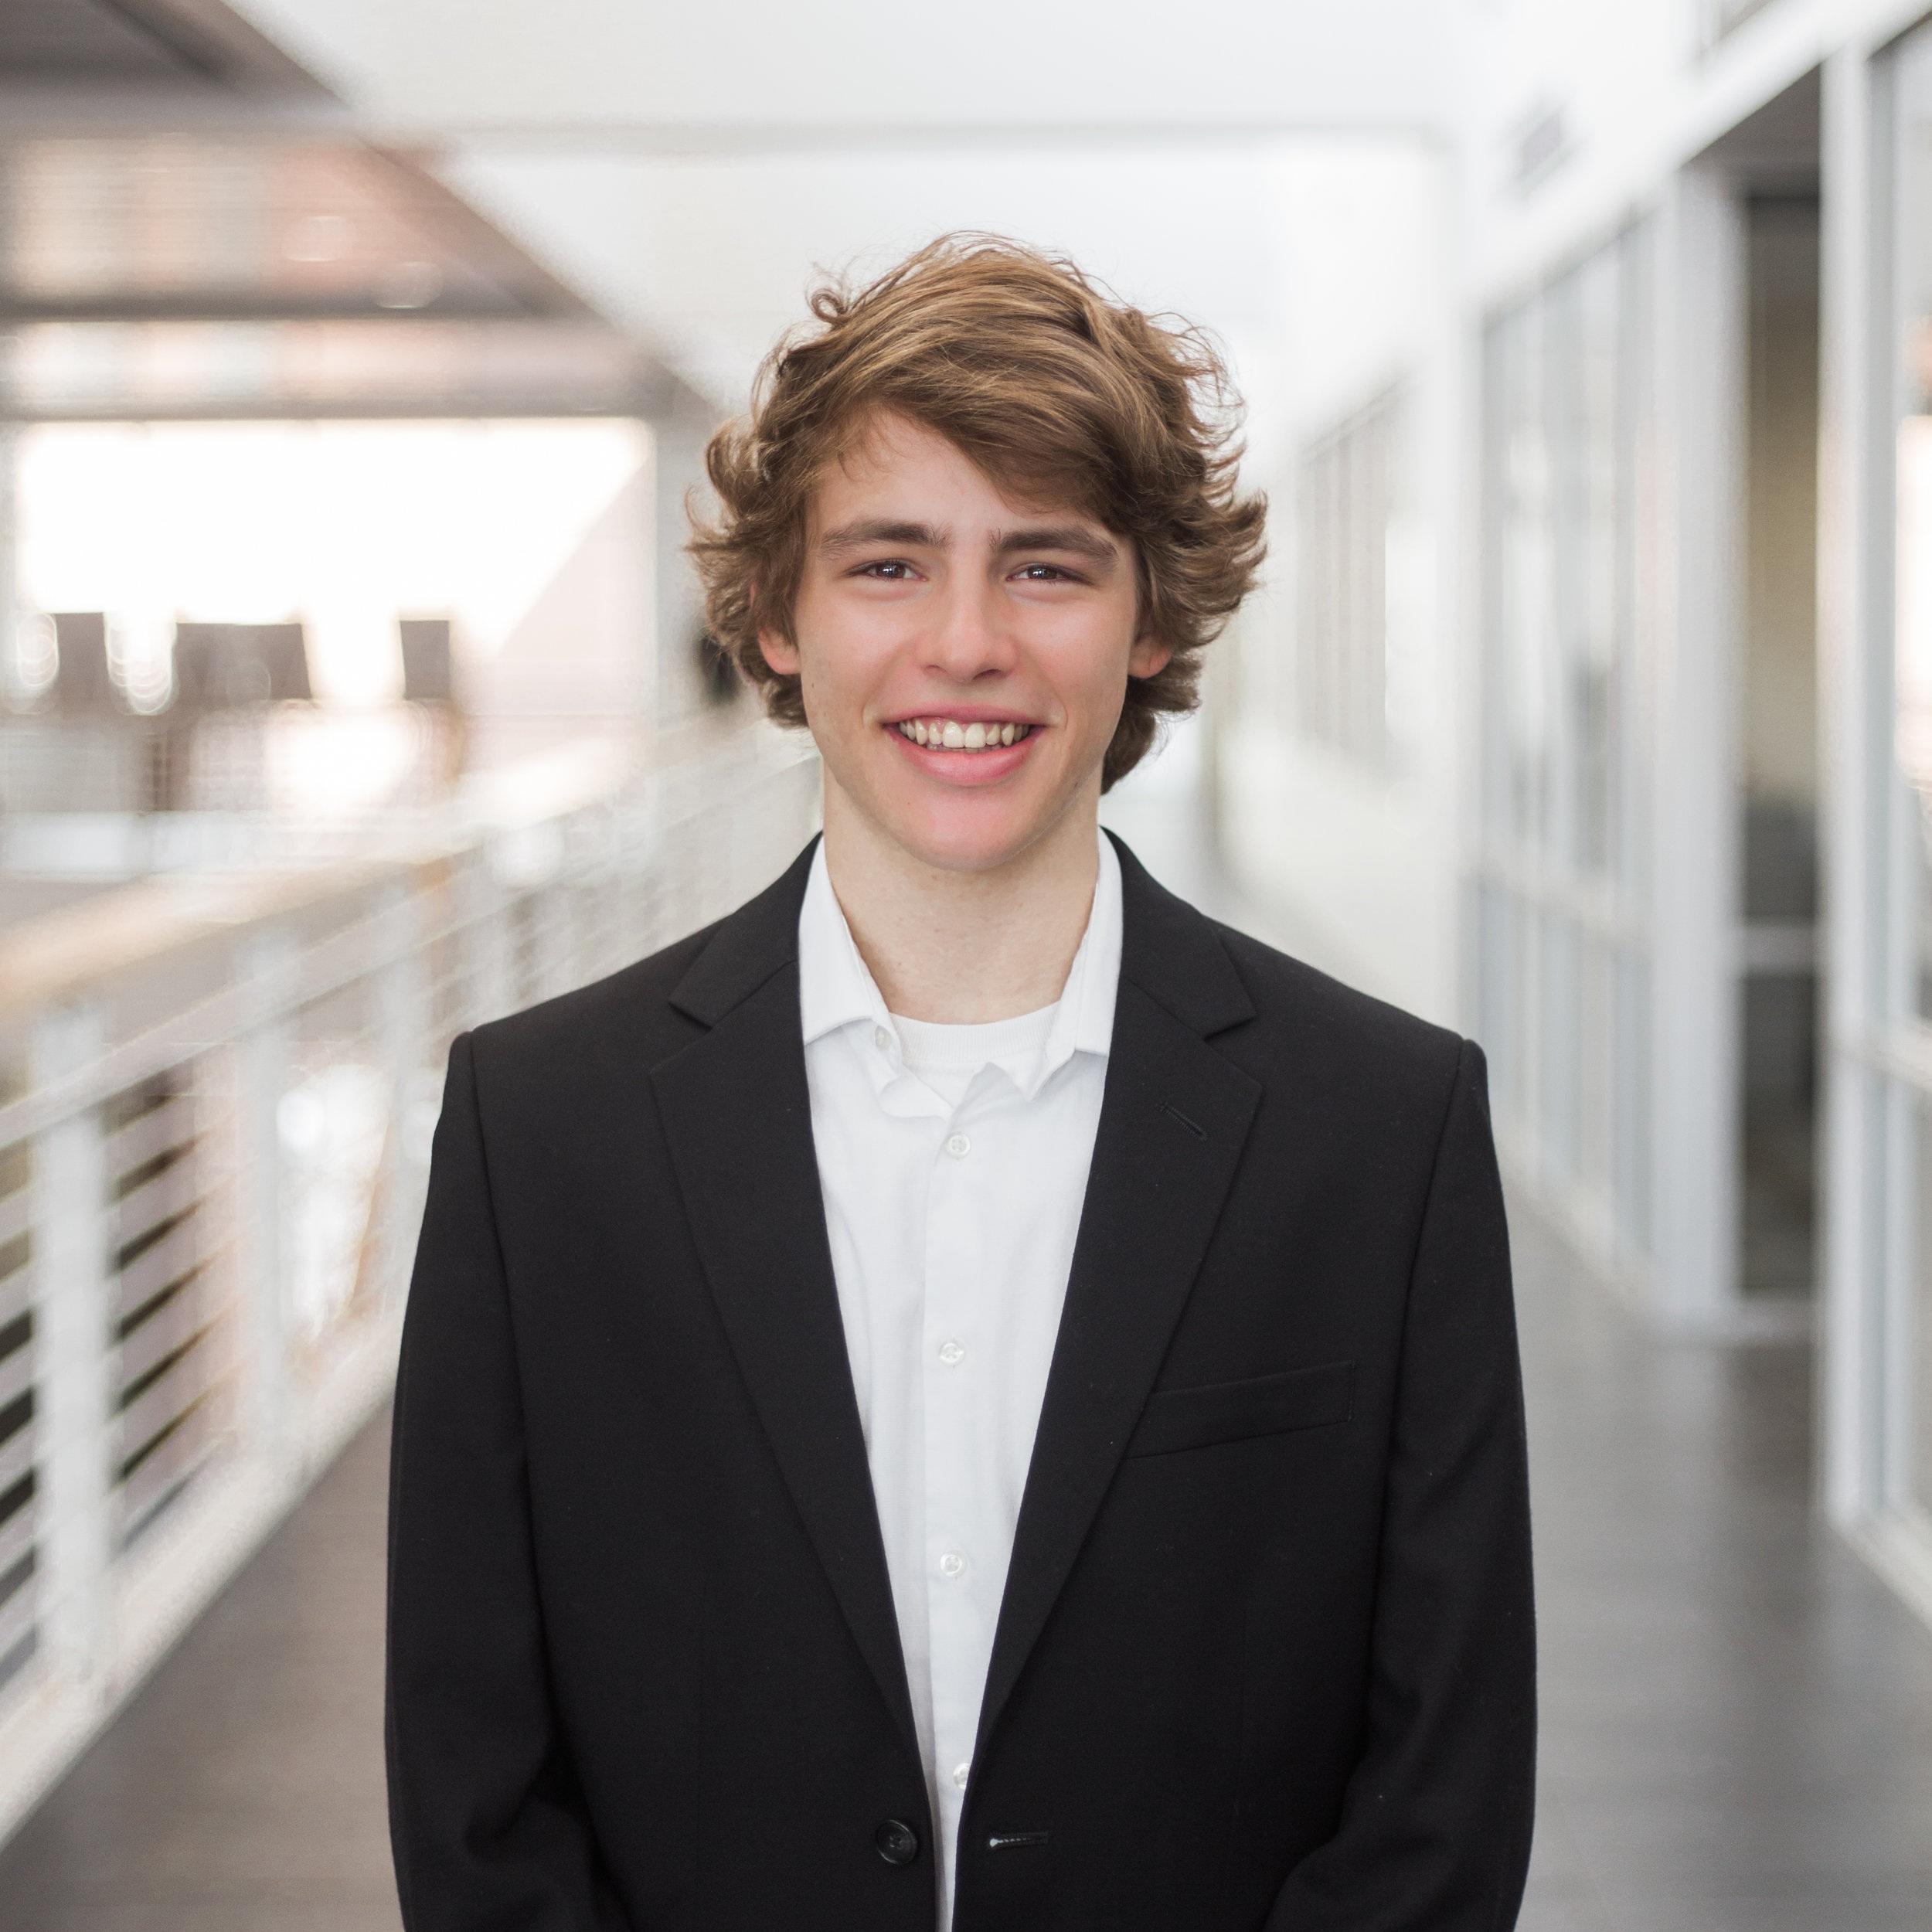 Hunter Babcock - Analyst, VP of External RelationsBSB '22, Entrepreneurial Management